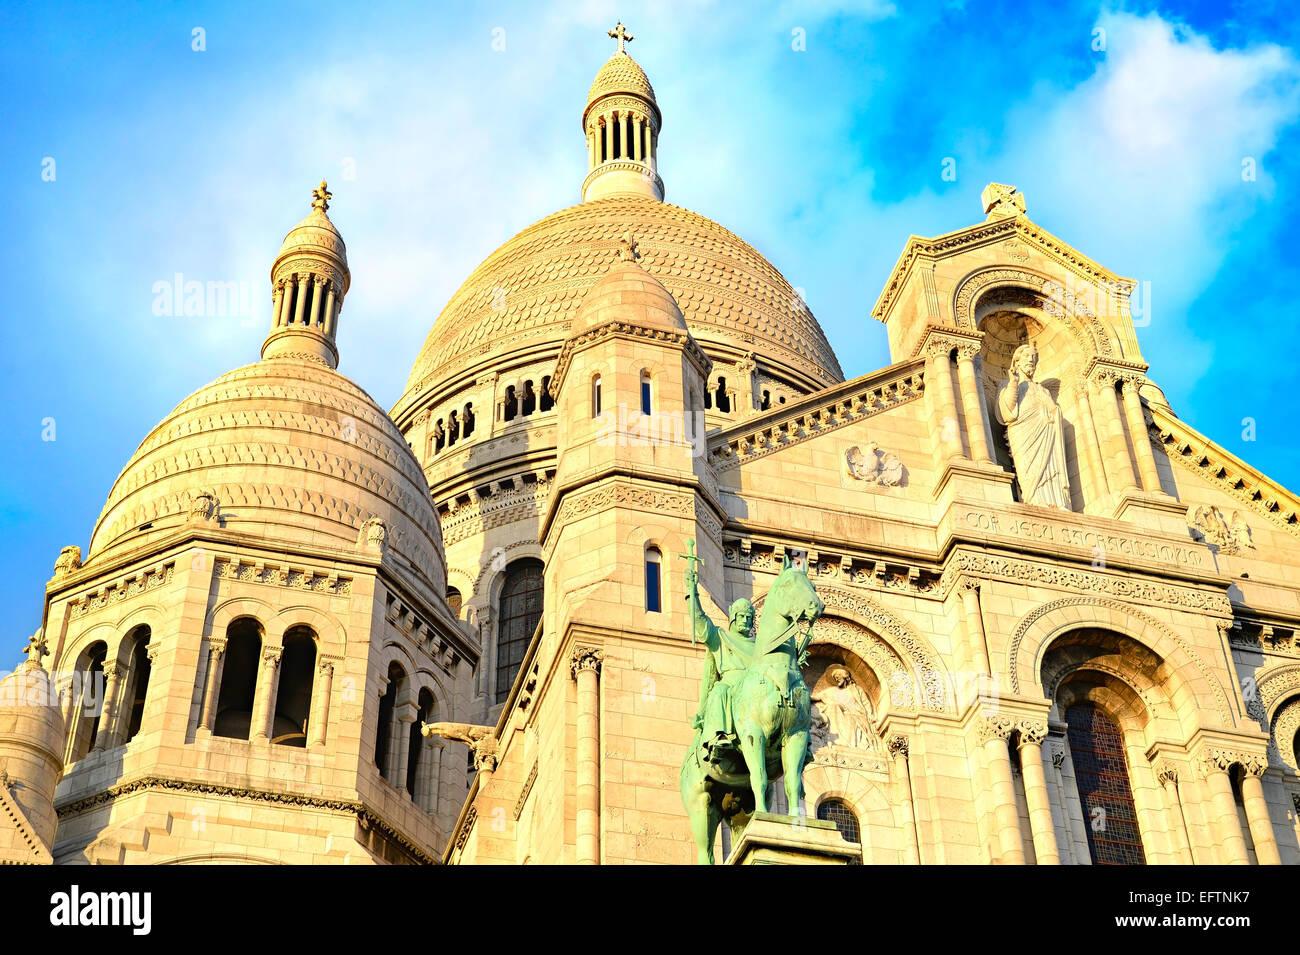 The Basilica of the Sacred Heart of Jesus (Basilique du Sacre-Coeur) on Montmartre hill, Paris - Stock Image